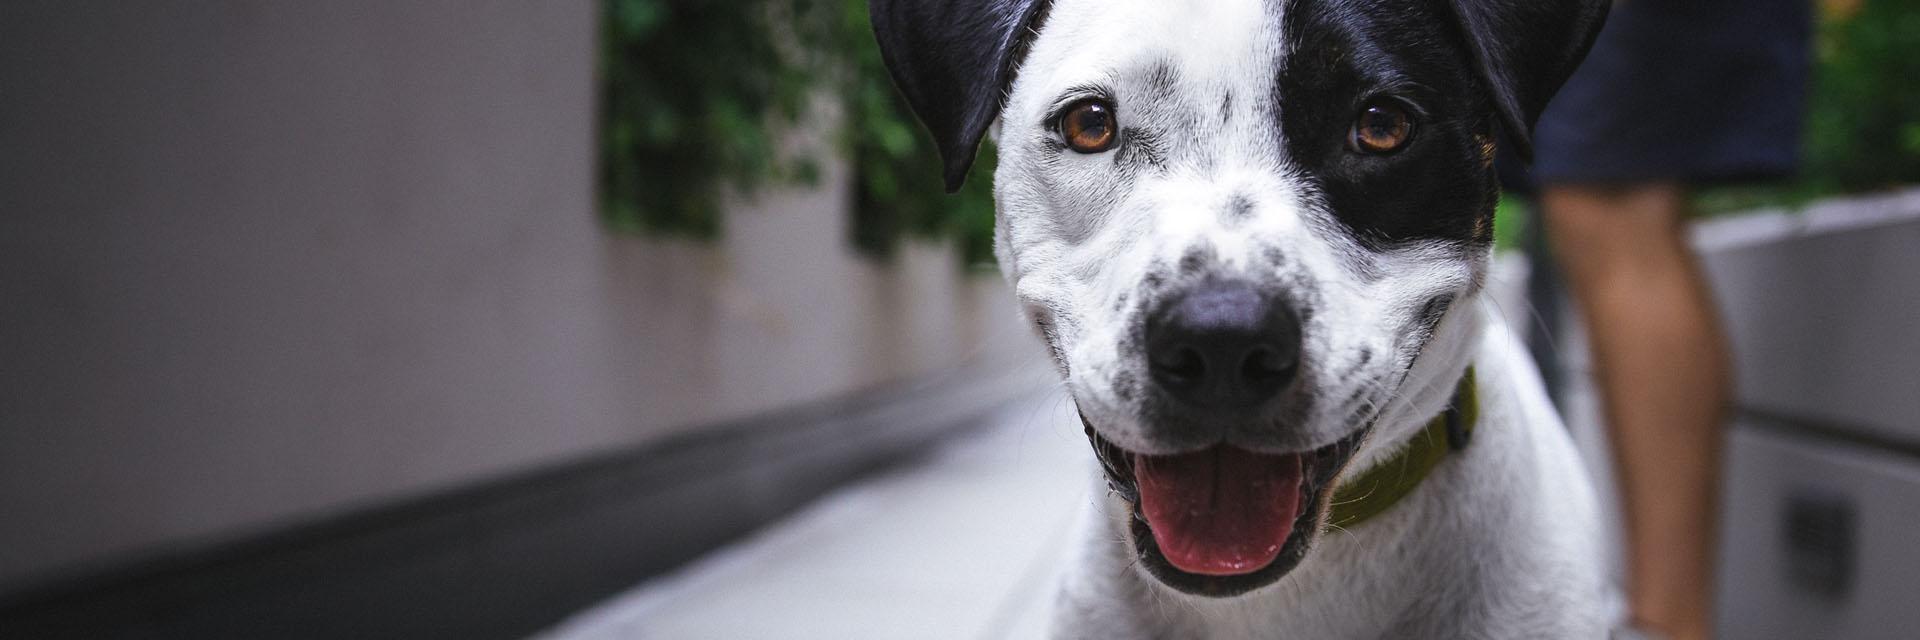 Black and White Dog Walking with Companion - Faulkville Animal Hospital - Bloomingdale, GA